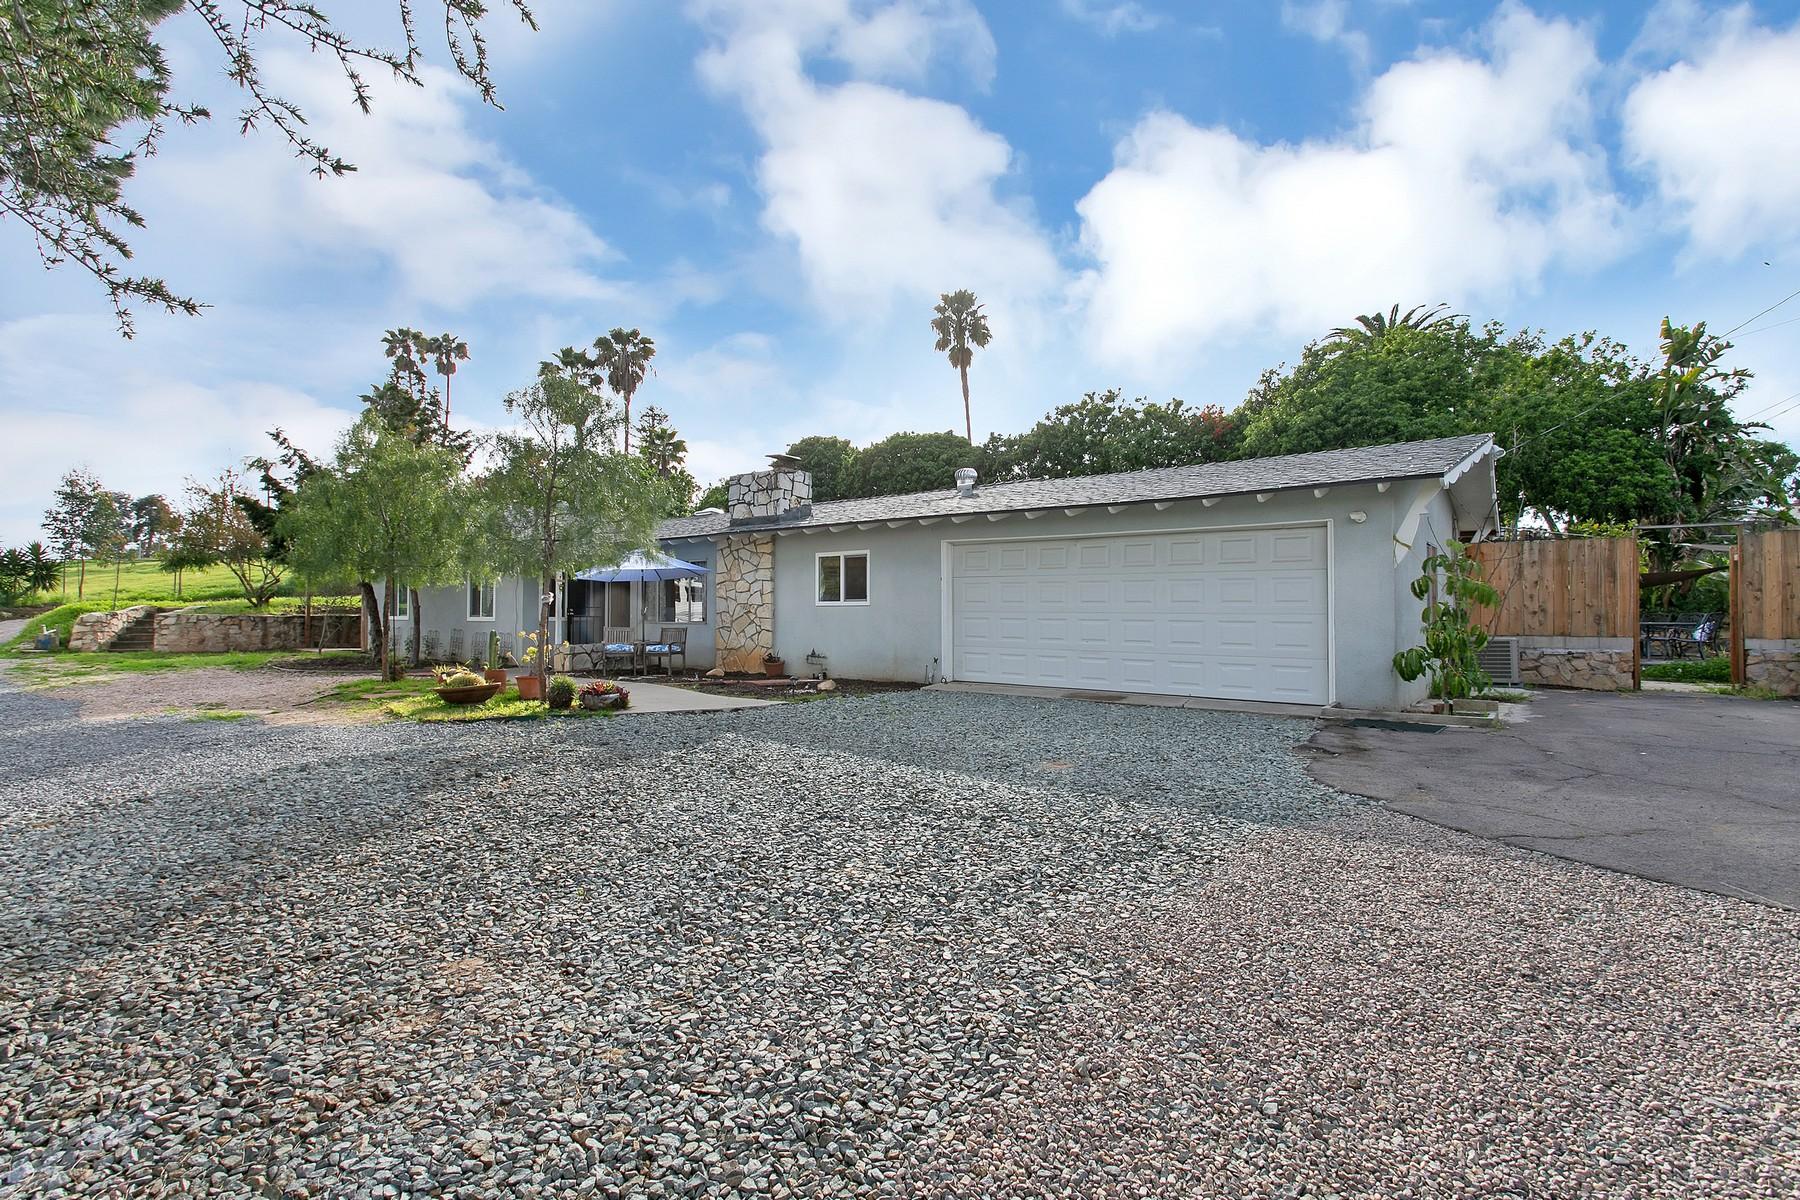 Single Family Home for Active at 731 Matagual Drive Vista, California 92081 United States